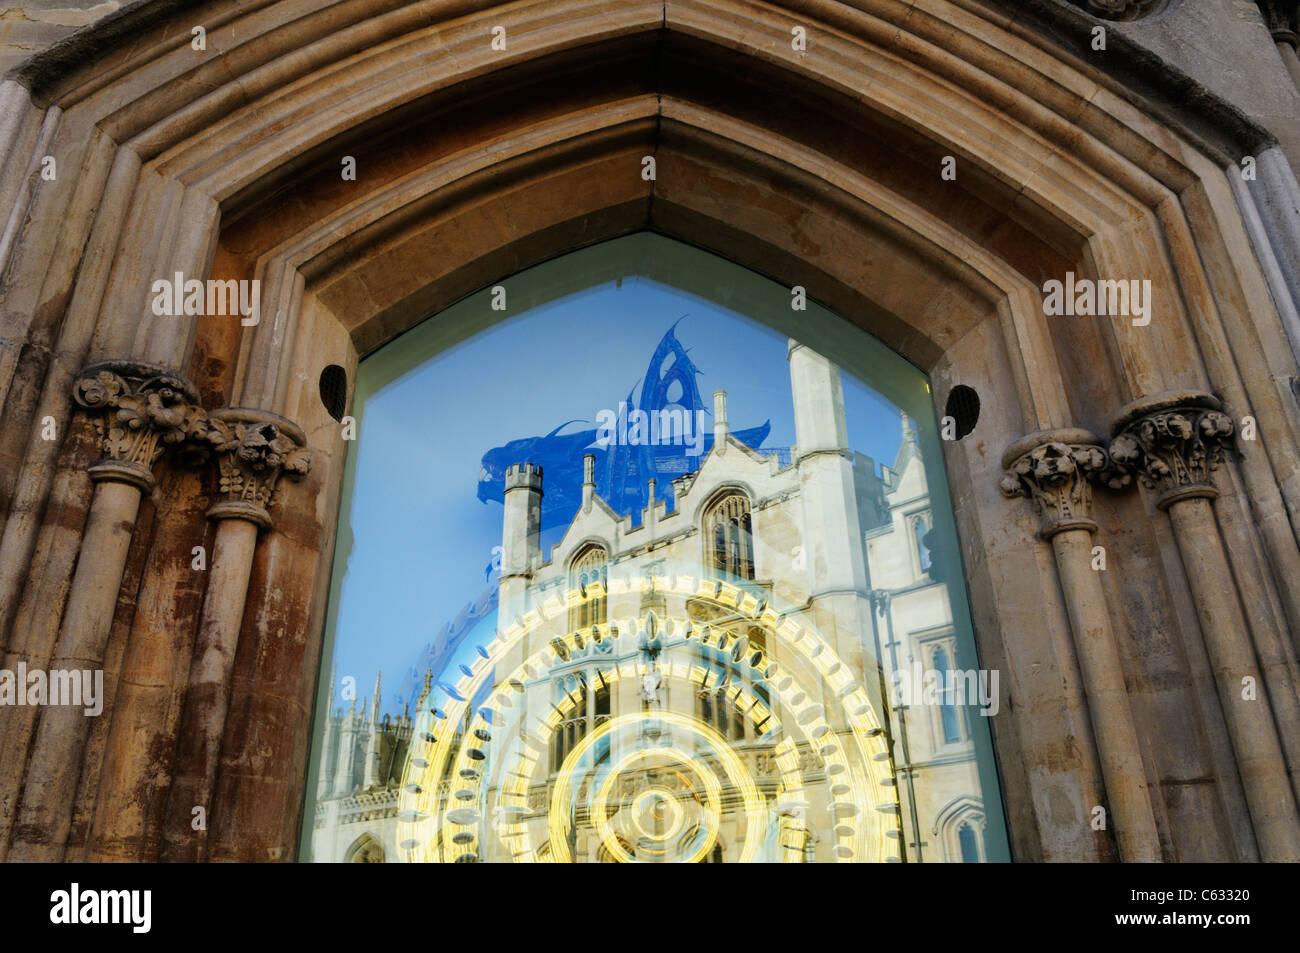 The Corpus Christi Clock with Reflection of King's College, Cambridge, England, UK - Stock Image